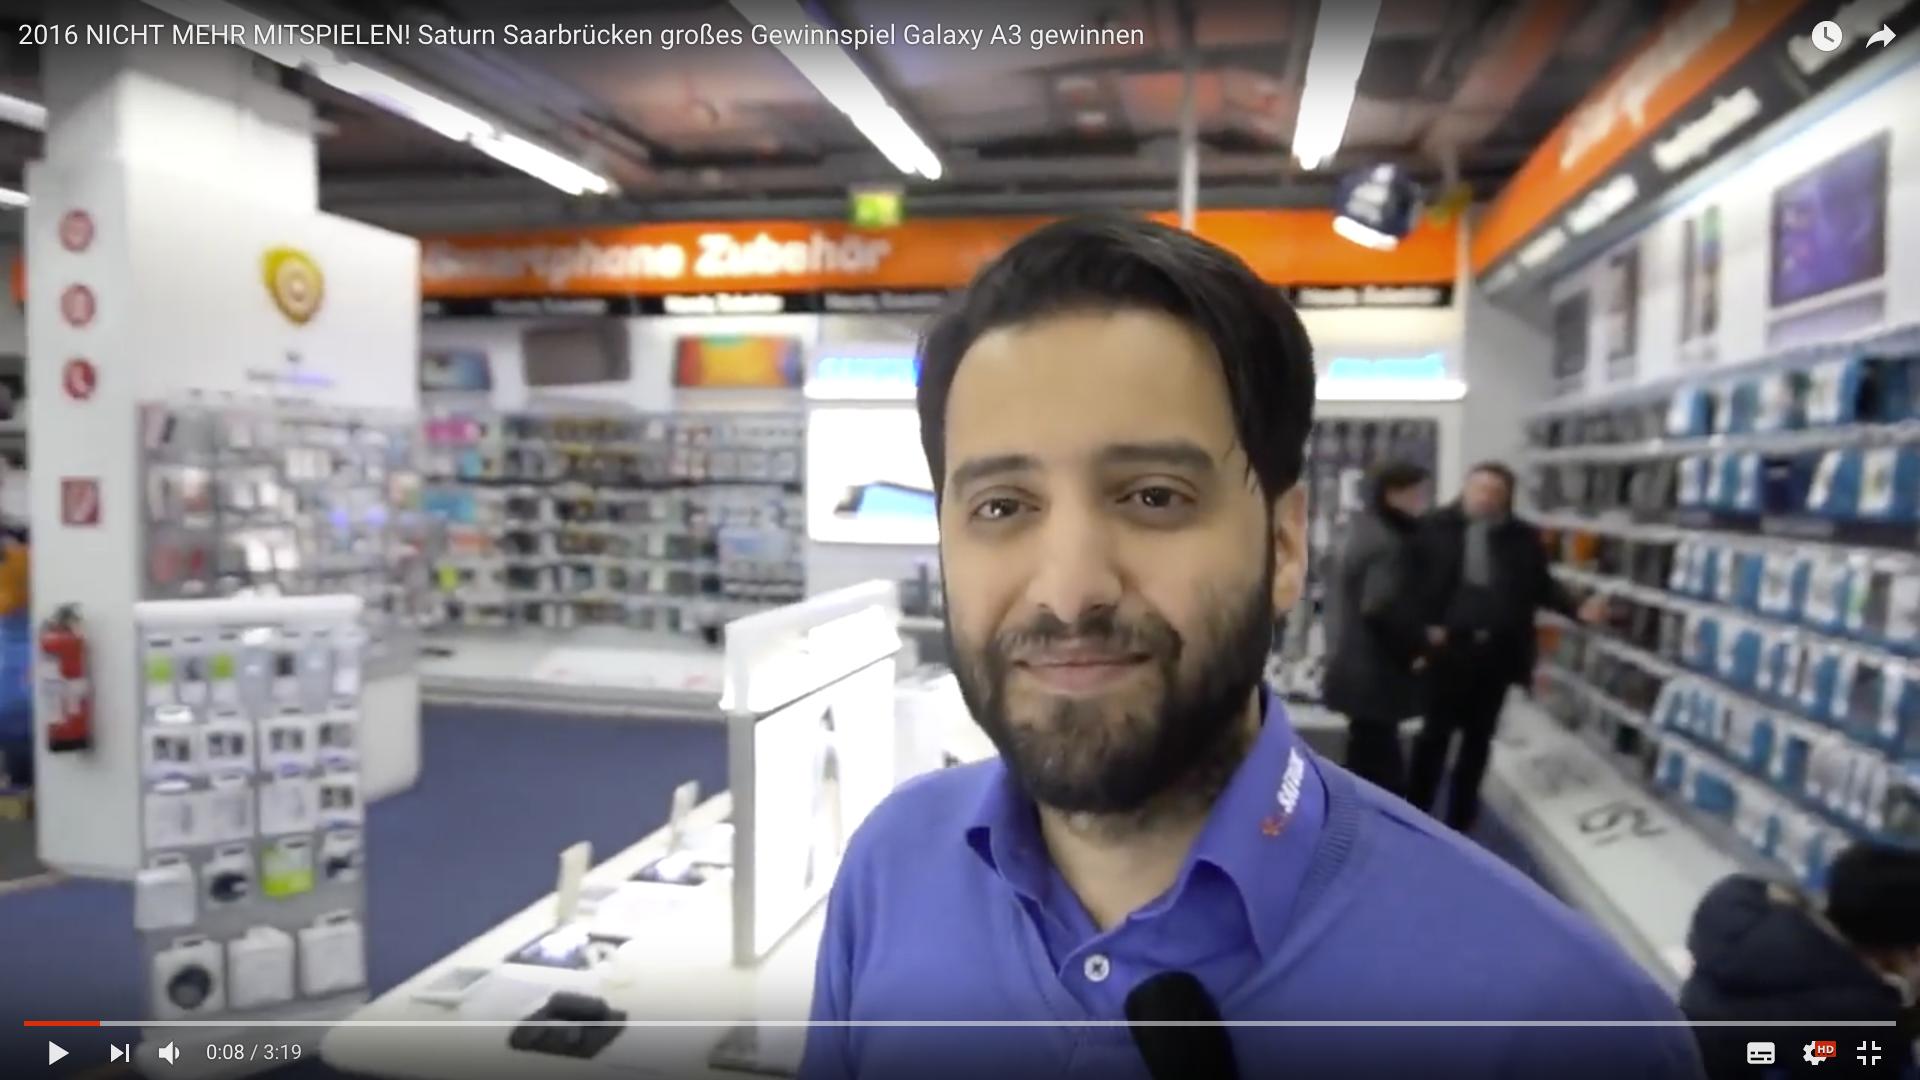 2017 Saturn Saarbrücken großes Gewinnspiel Galaxy A3 Mitarbeiter_MSM_MEDIEN_SAAR_MOSEL_SAARLAND_FERNSEHEN_1_ED_SAAR